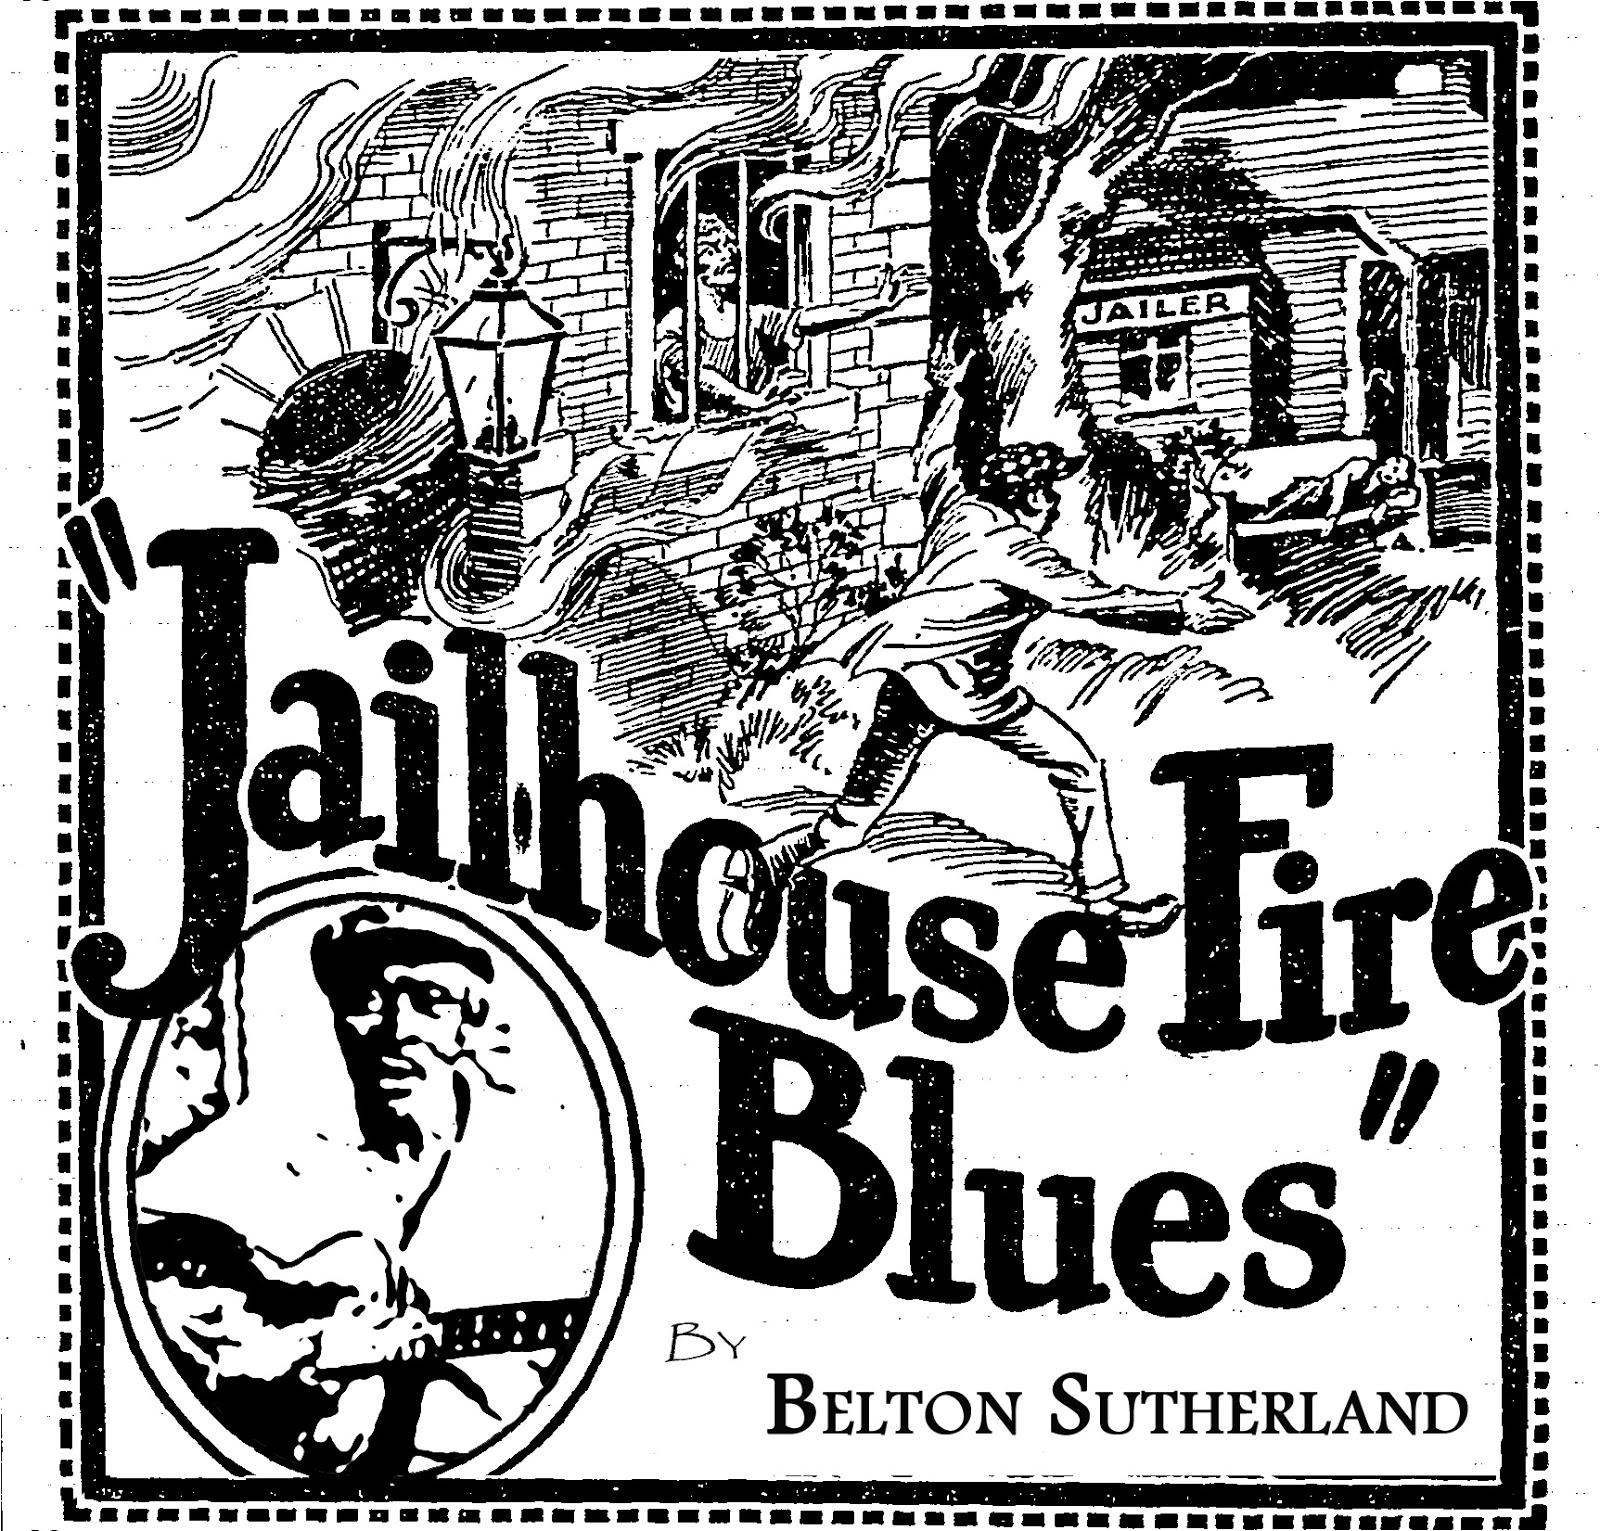 an anchor blues biography belton sutherland Vaudeville Hook